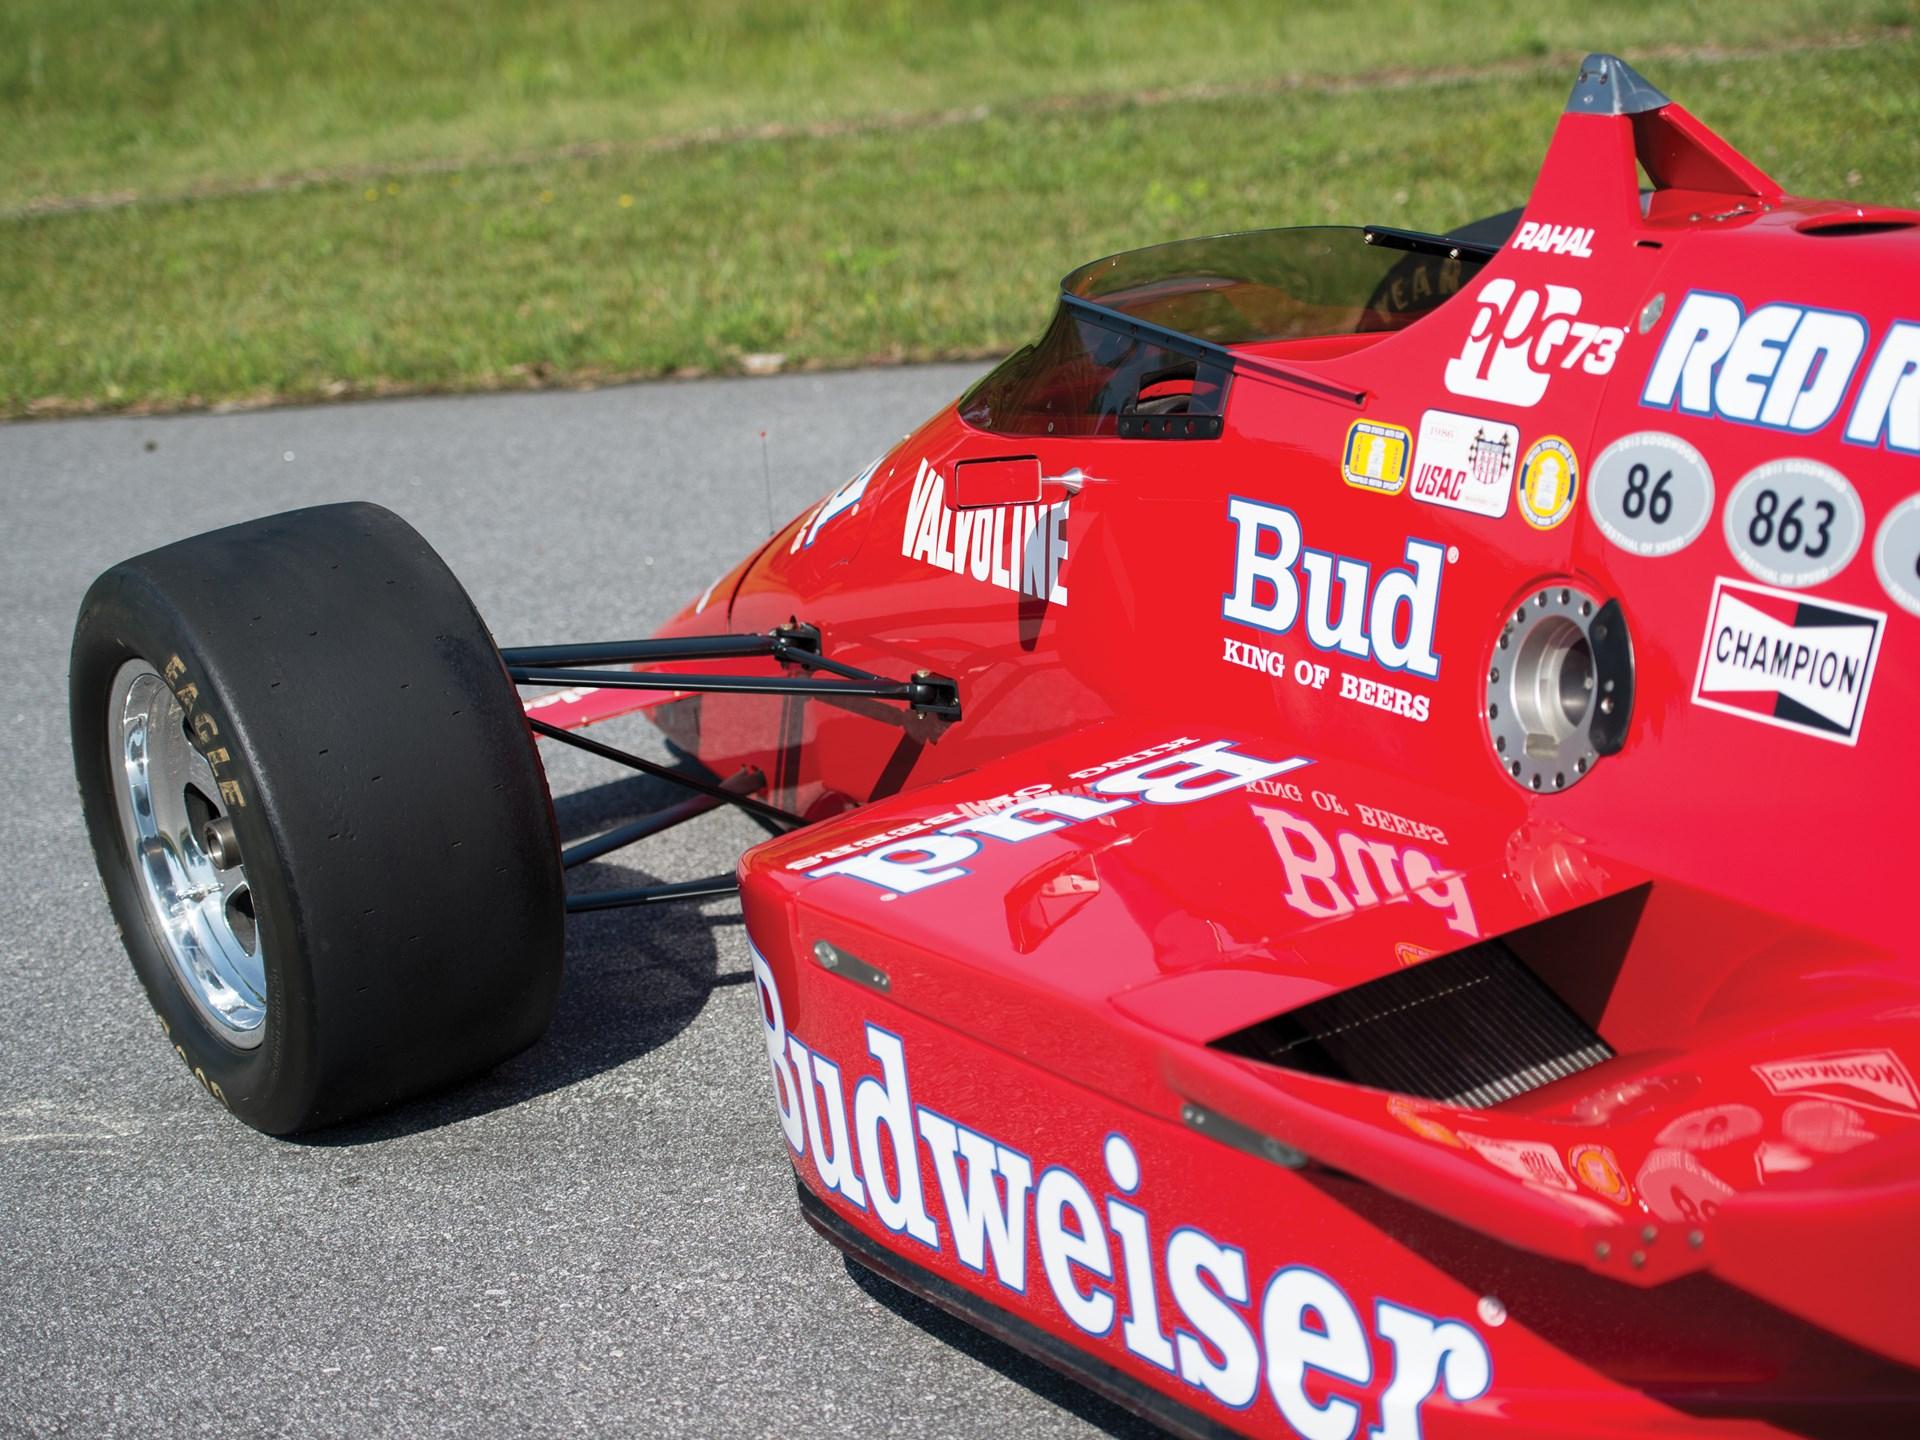 1986 March 86C Indianapolis